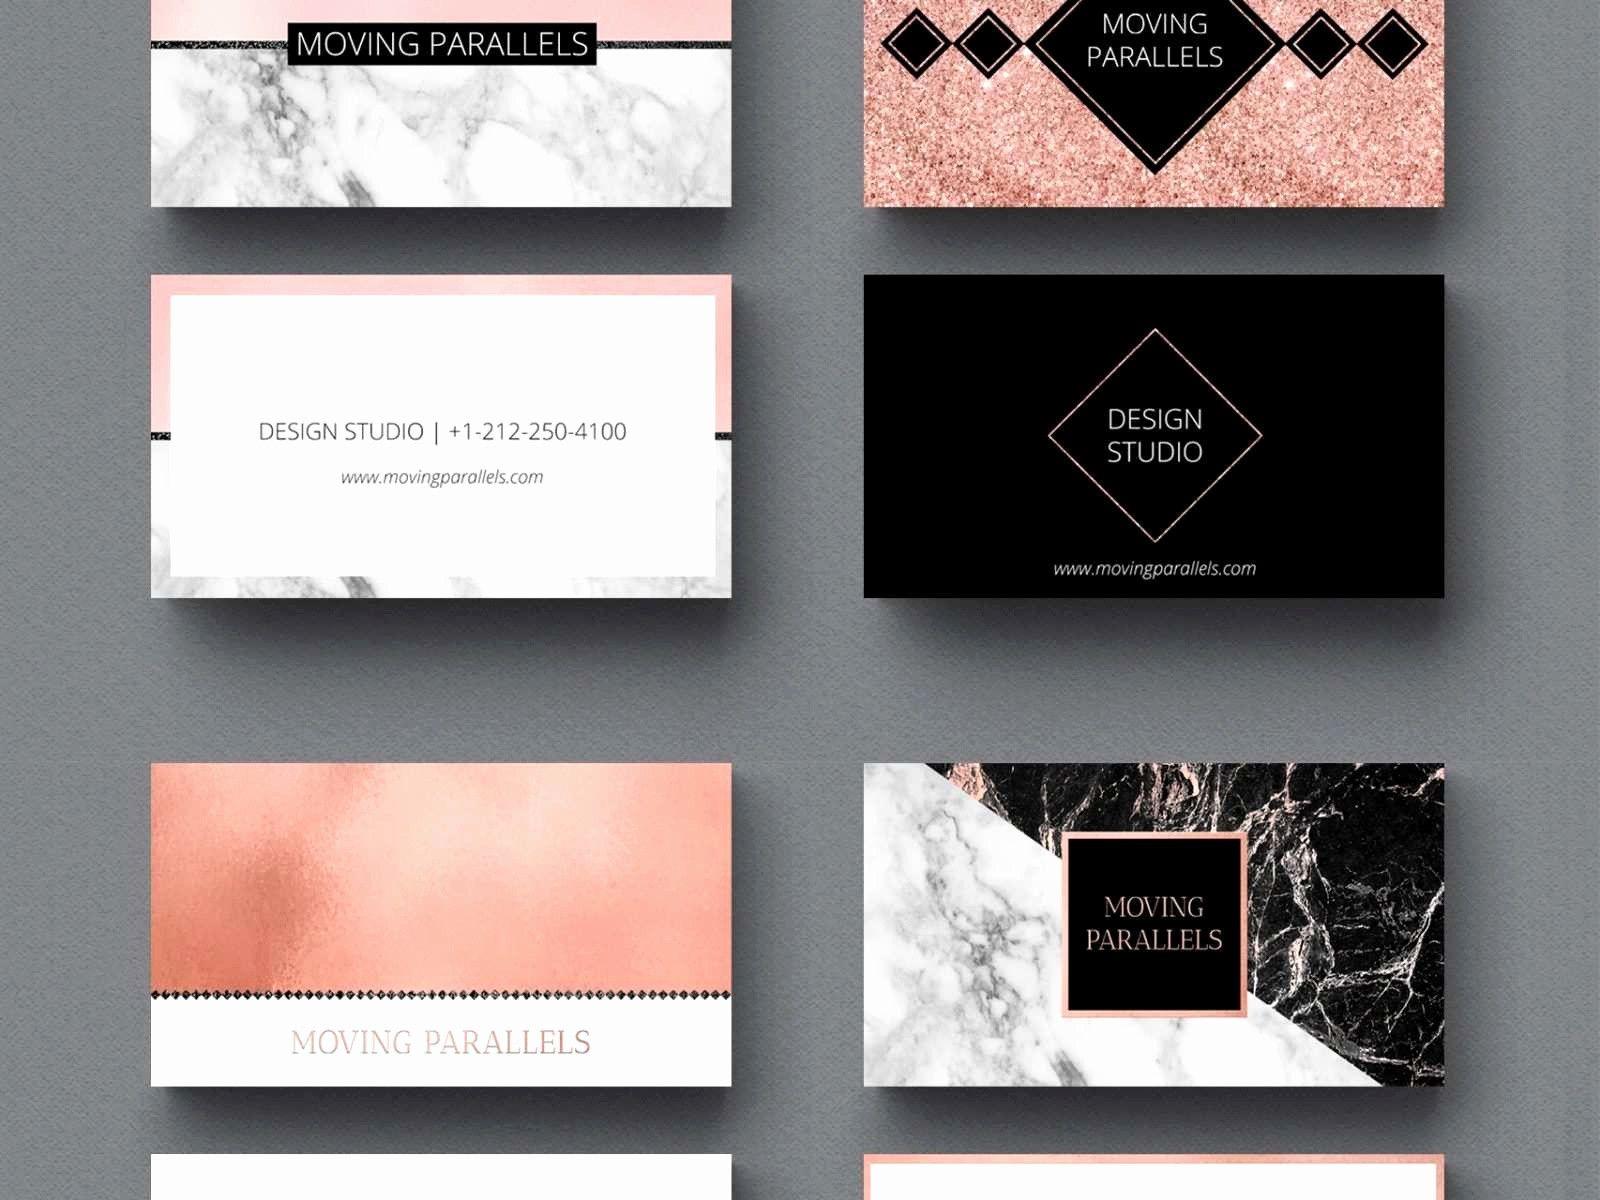 Esthetician Business Card Templates Esthetician Business Cards Free Printable Business Cards Printing Business Cards